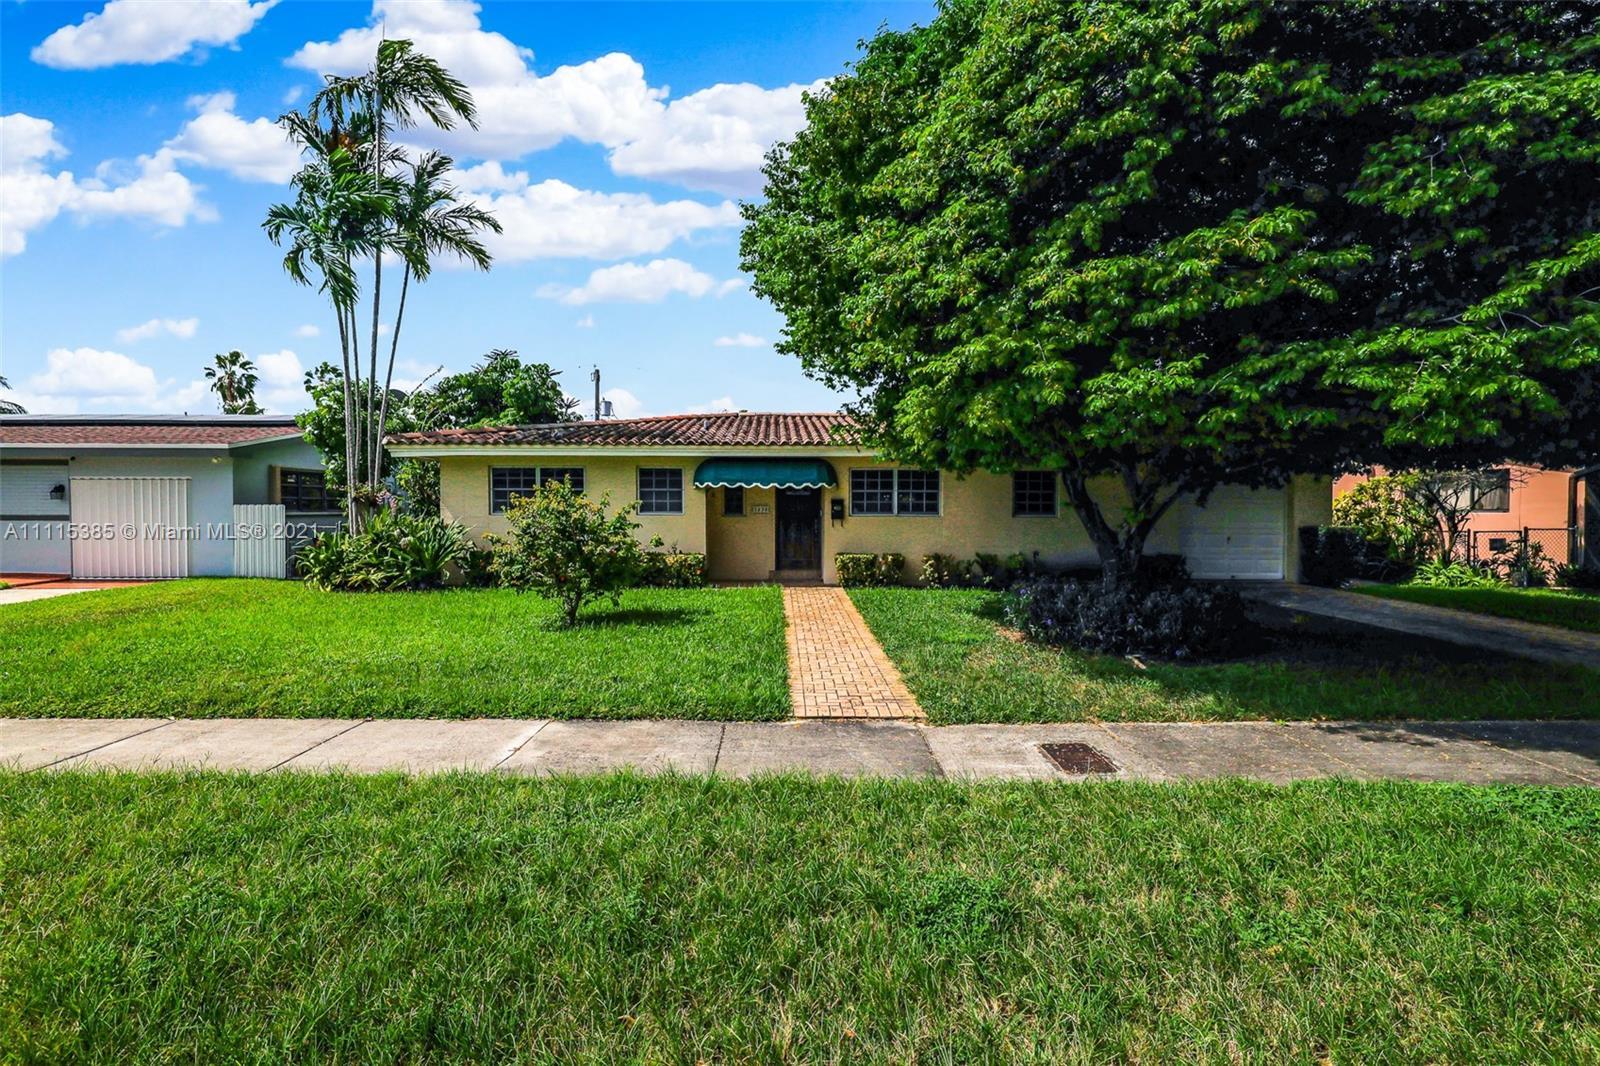 Single Family Home,For Sale,3230 SW 95th Ct, Miami, Florida 33165,Brickell,realty,broker,condos near me